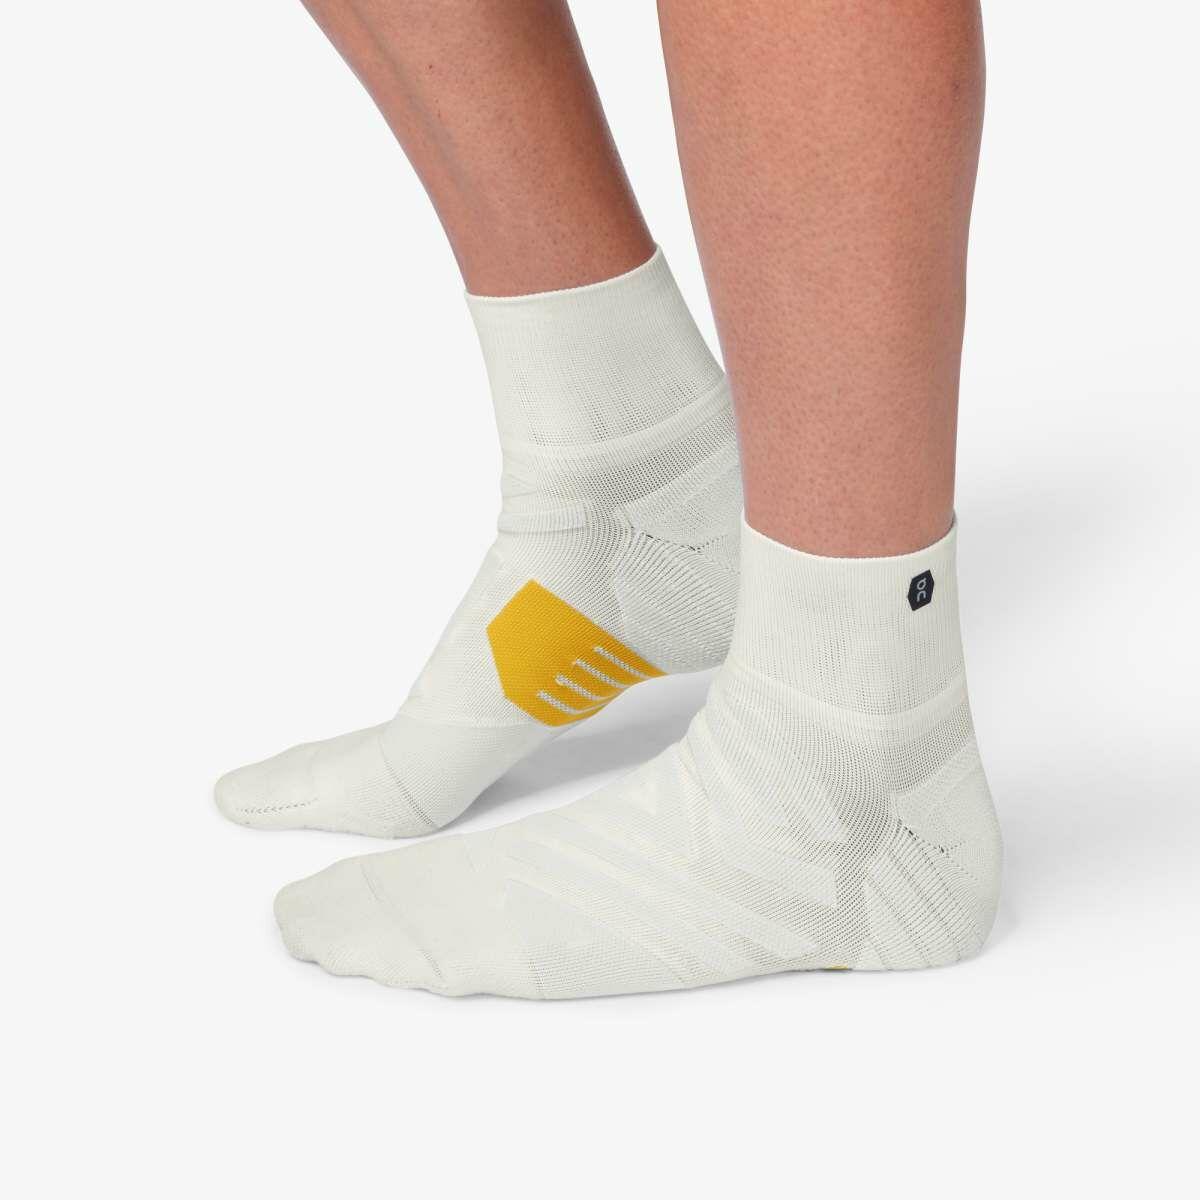 ON Mid Sock White Ice (White Ice)